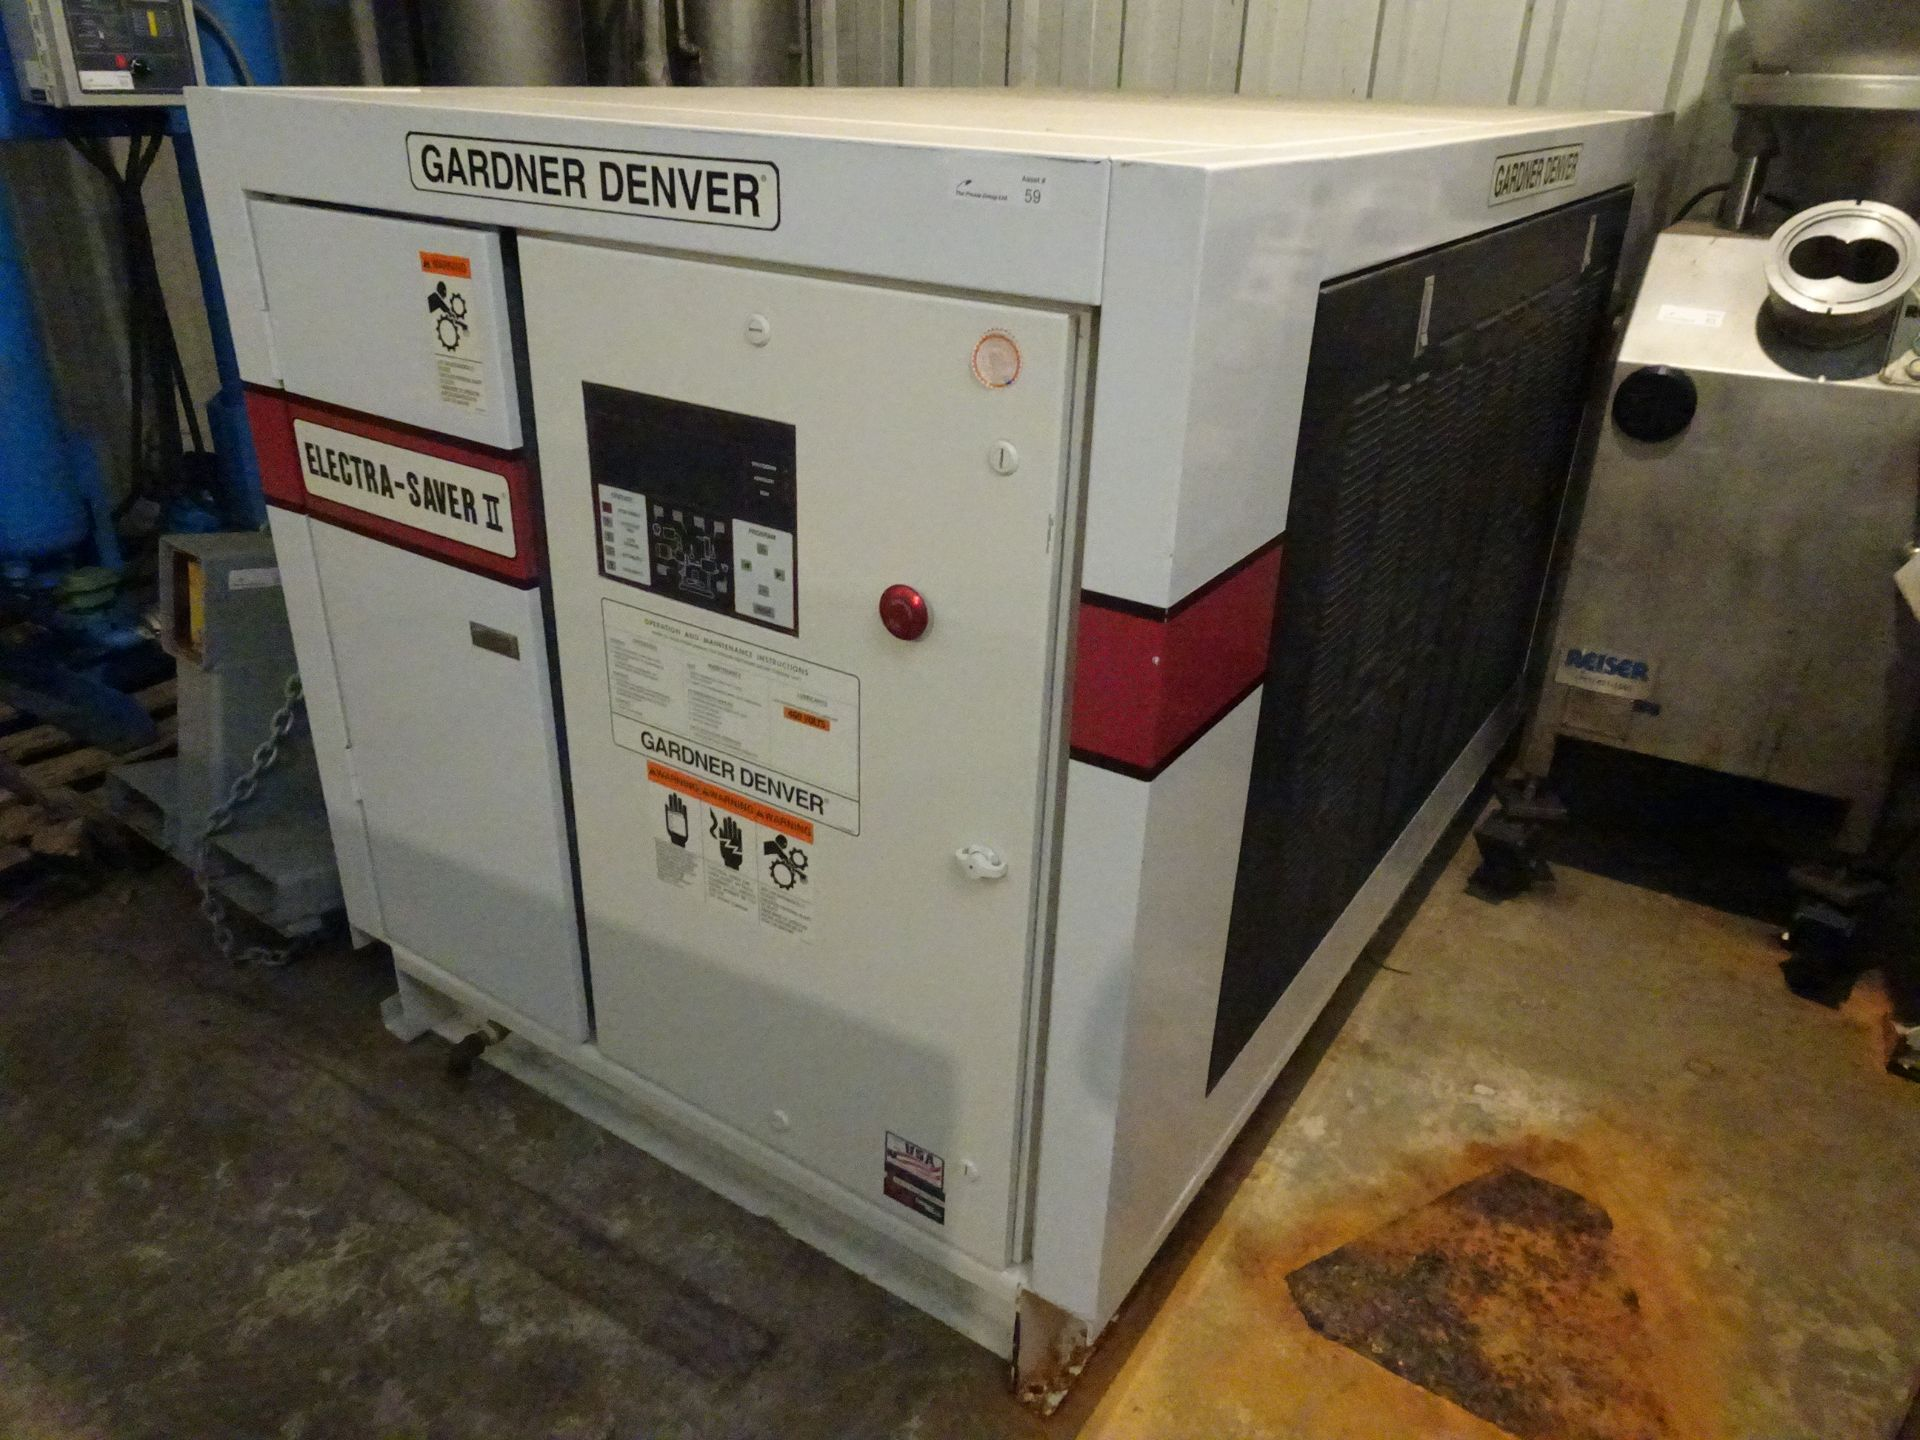 Lot 33 - Gardner Denver Model EBH99G Elecrta-Saver II 50HP Rotary Screw Air Compressor